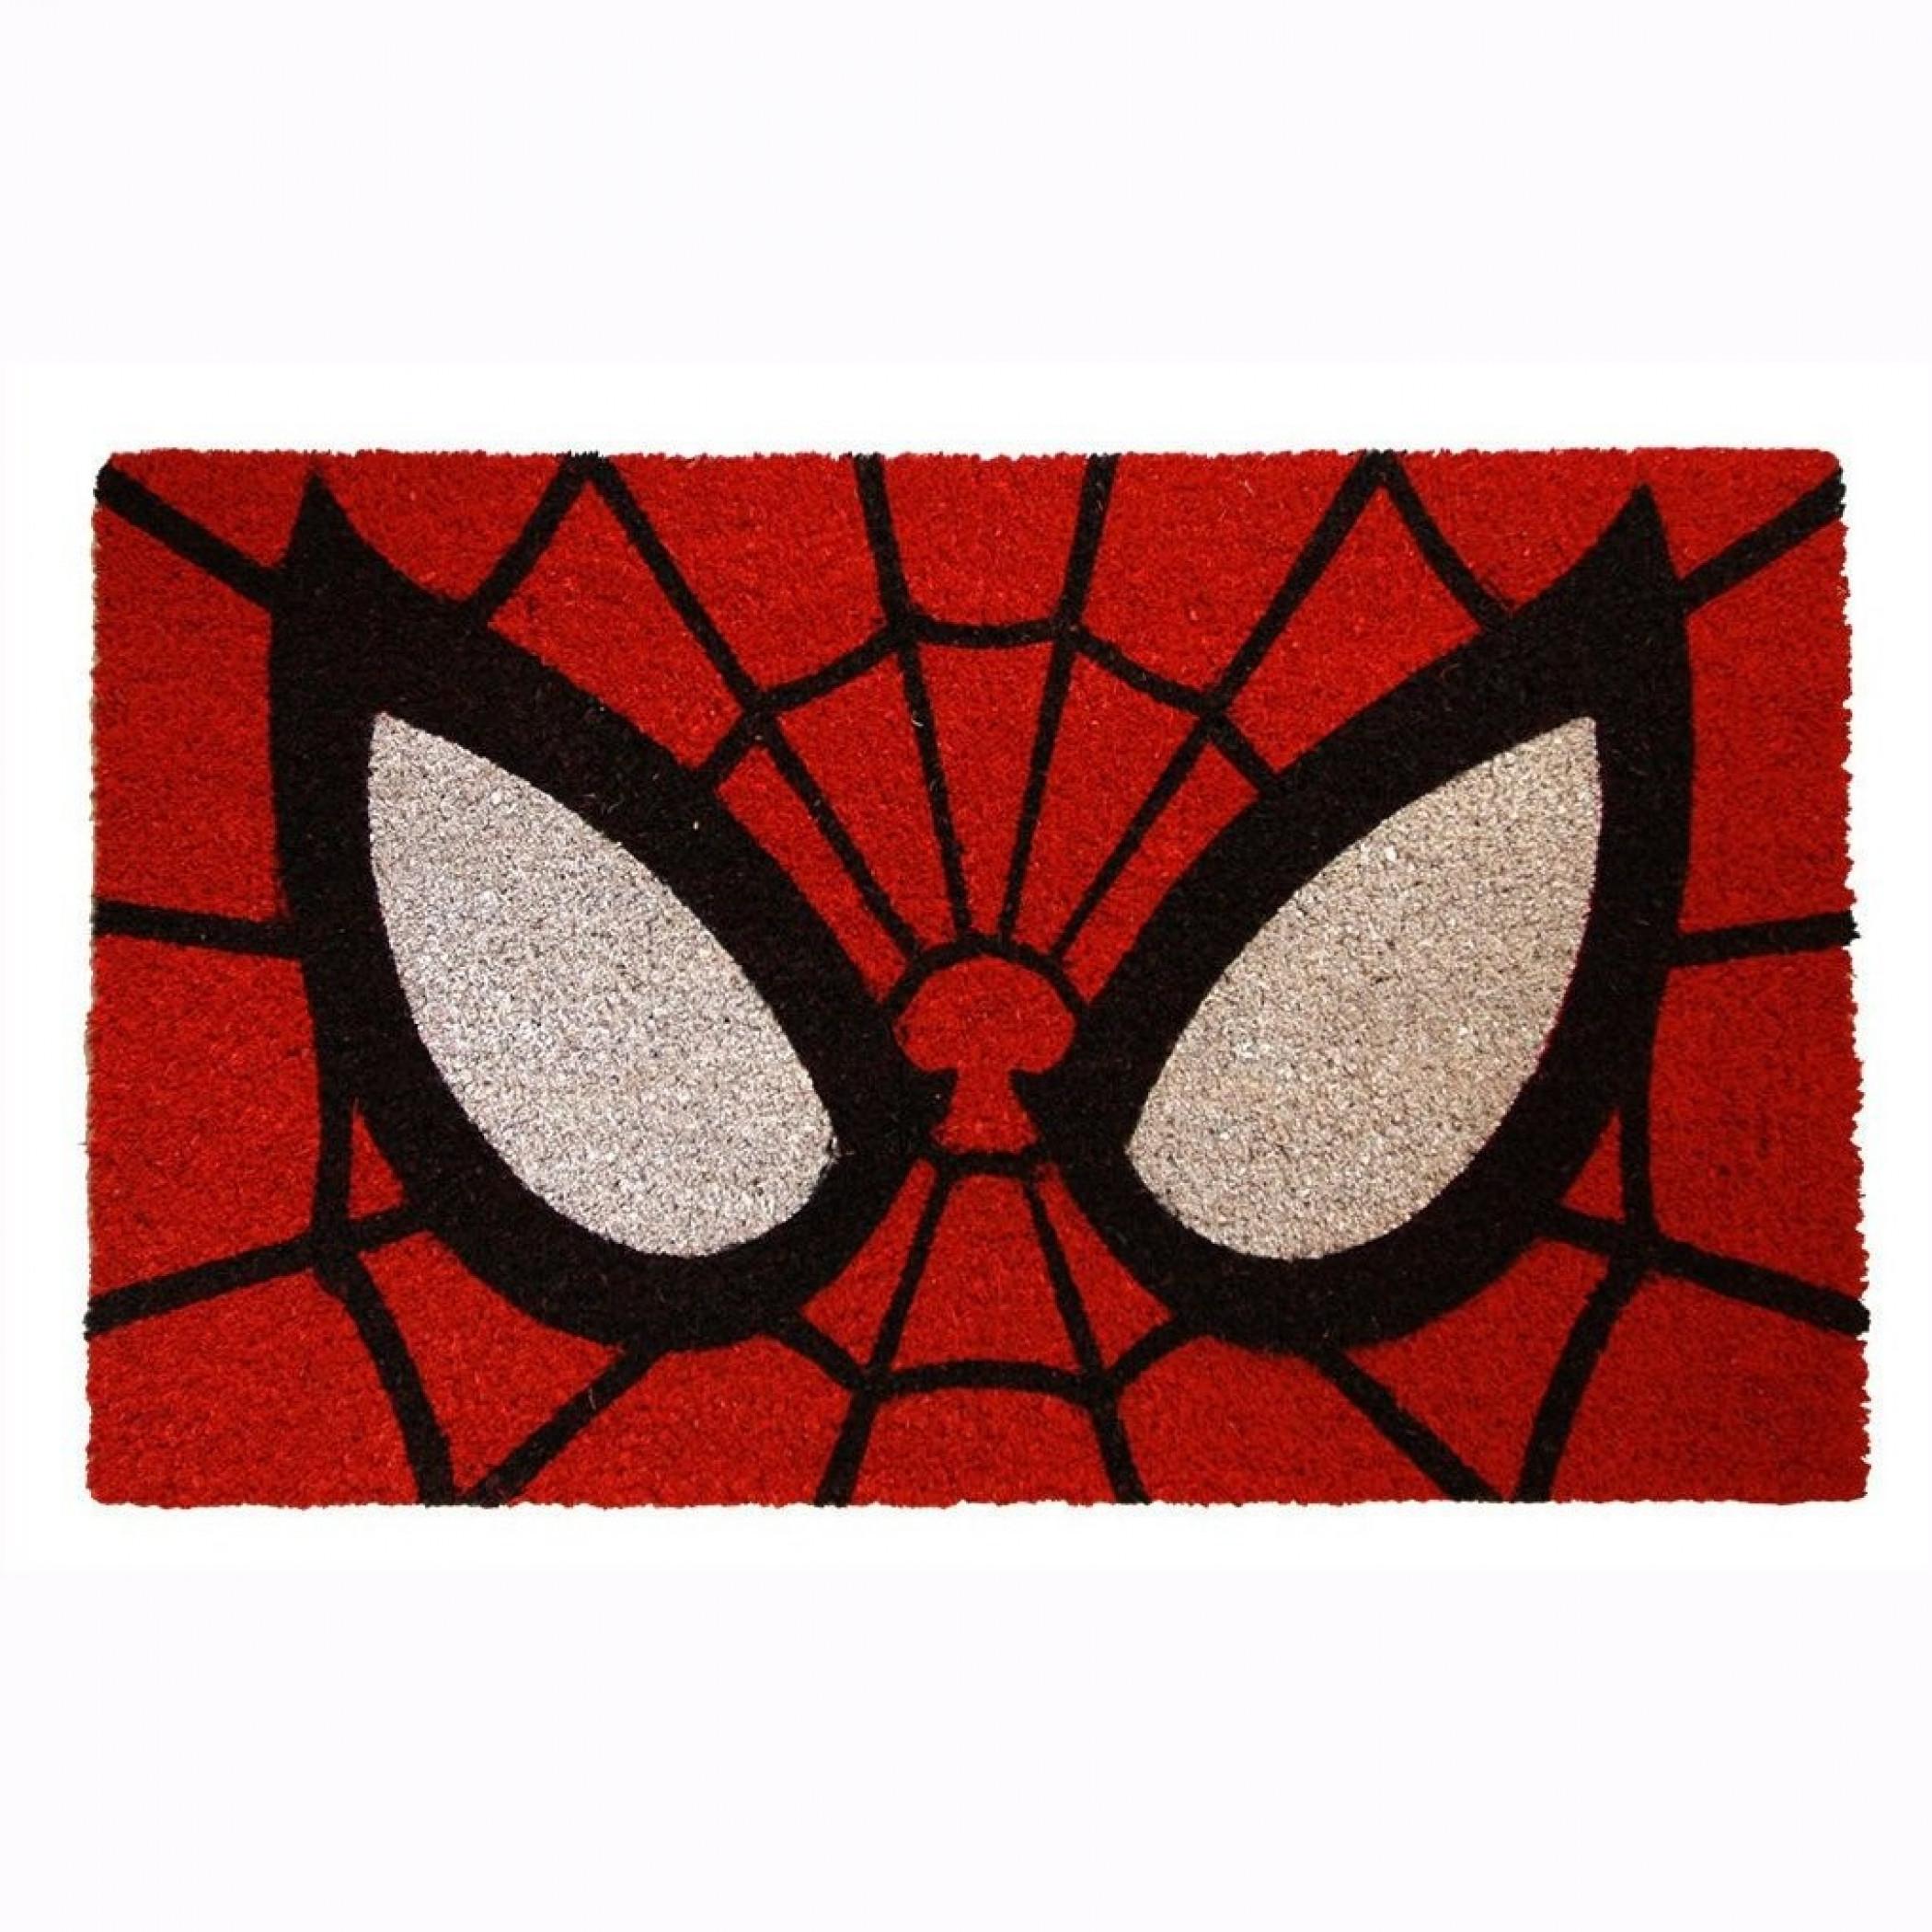 "Spider-Man Eyes 17""x 29"" Doormat with Non-skid Back"